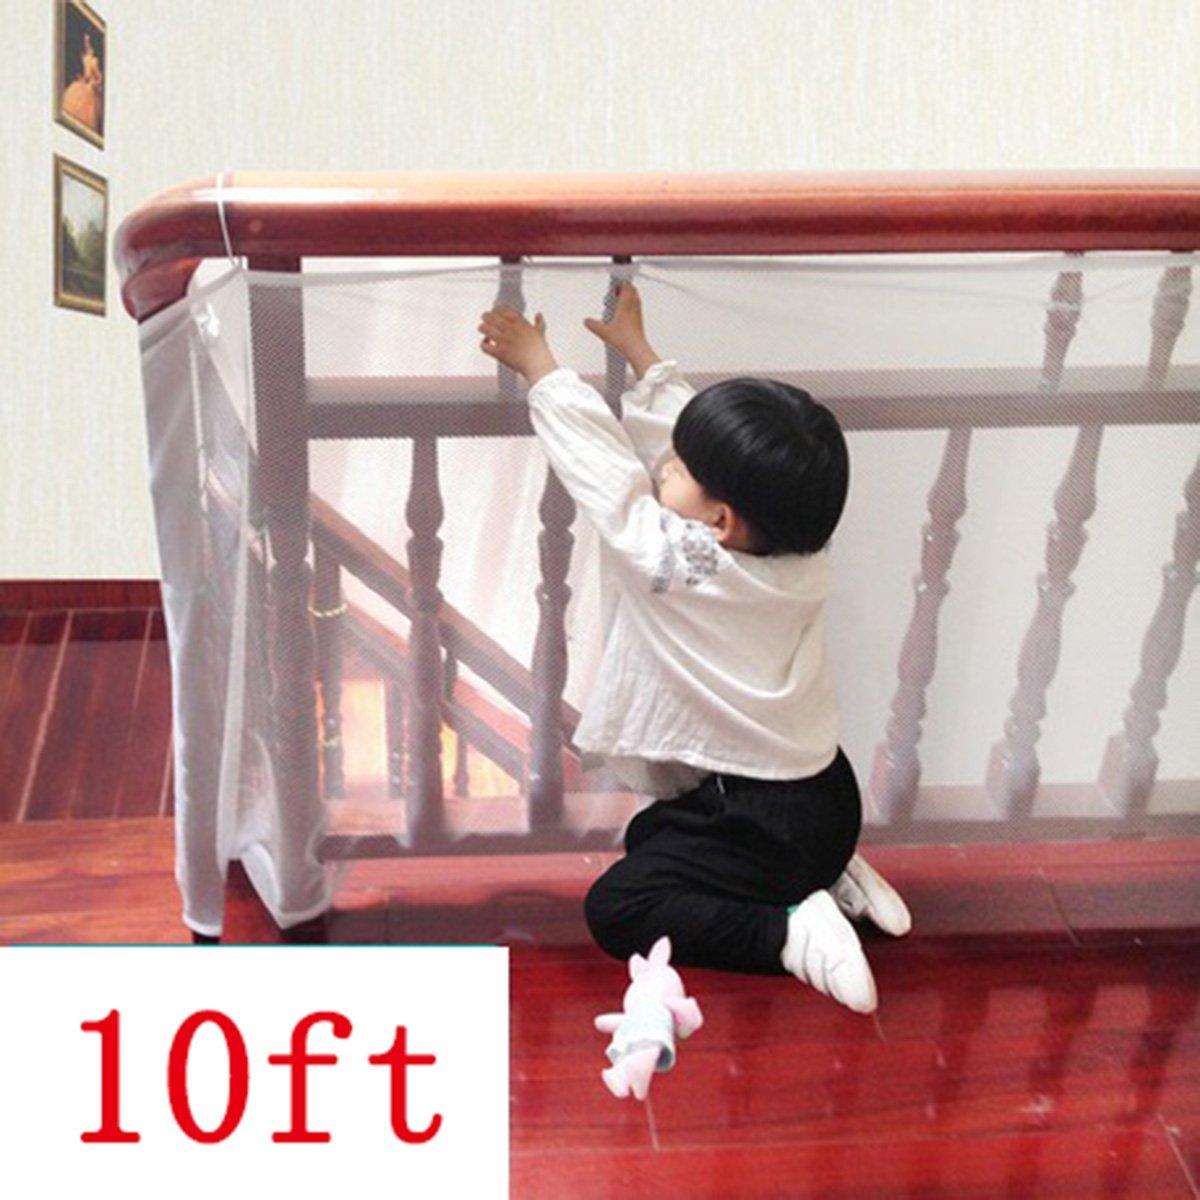 Beanbone Kalolary Child Safety Rail Net 10ft L X 2 5ft H